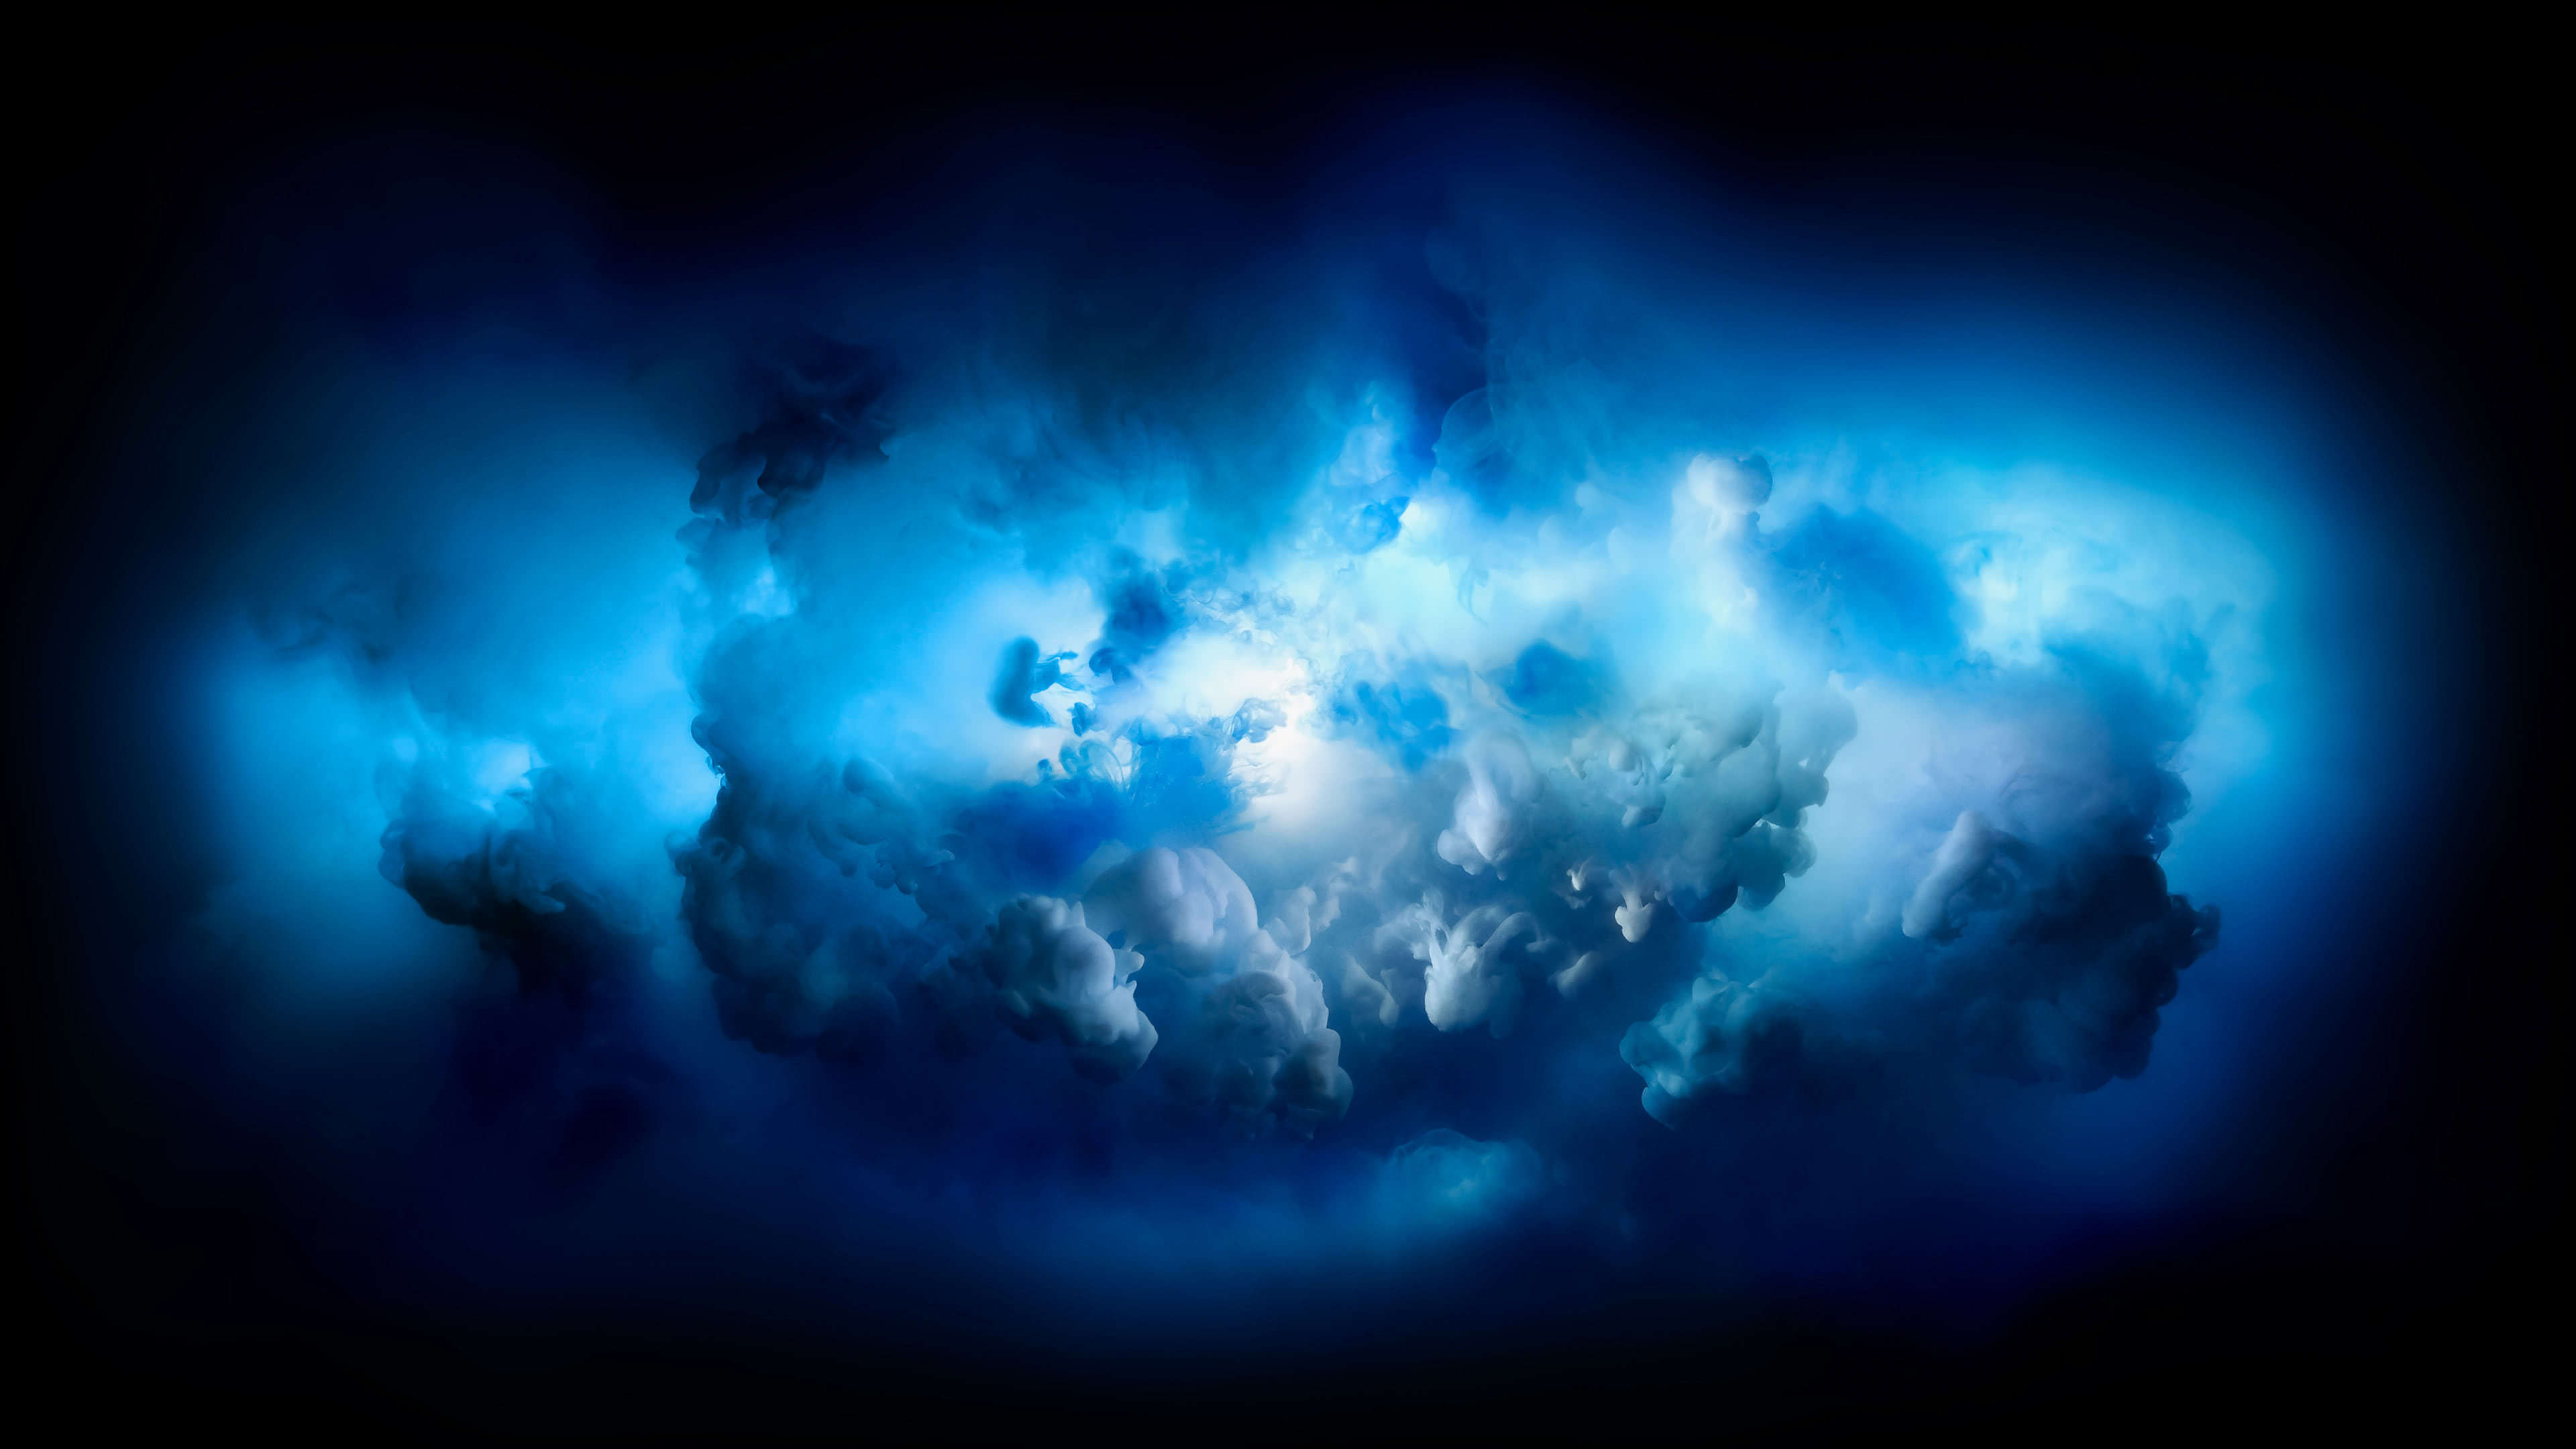 Mac OSX Blue Clouds Background UHD 4K Wallpaper Pixelz 3840x2160